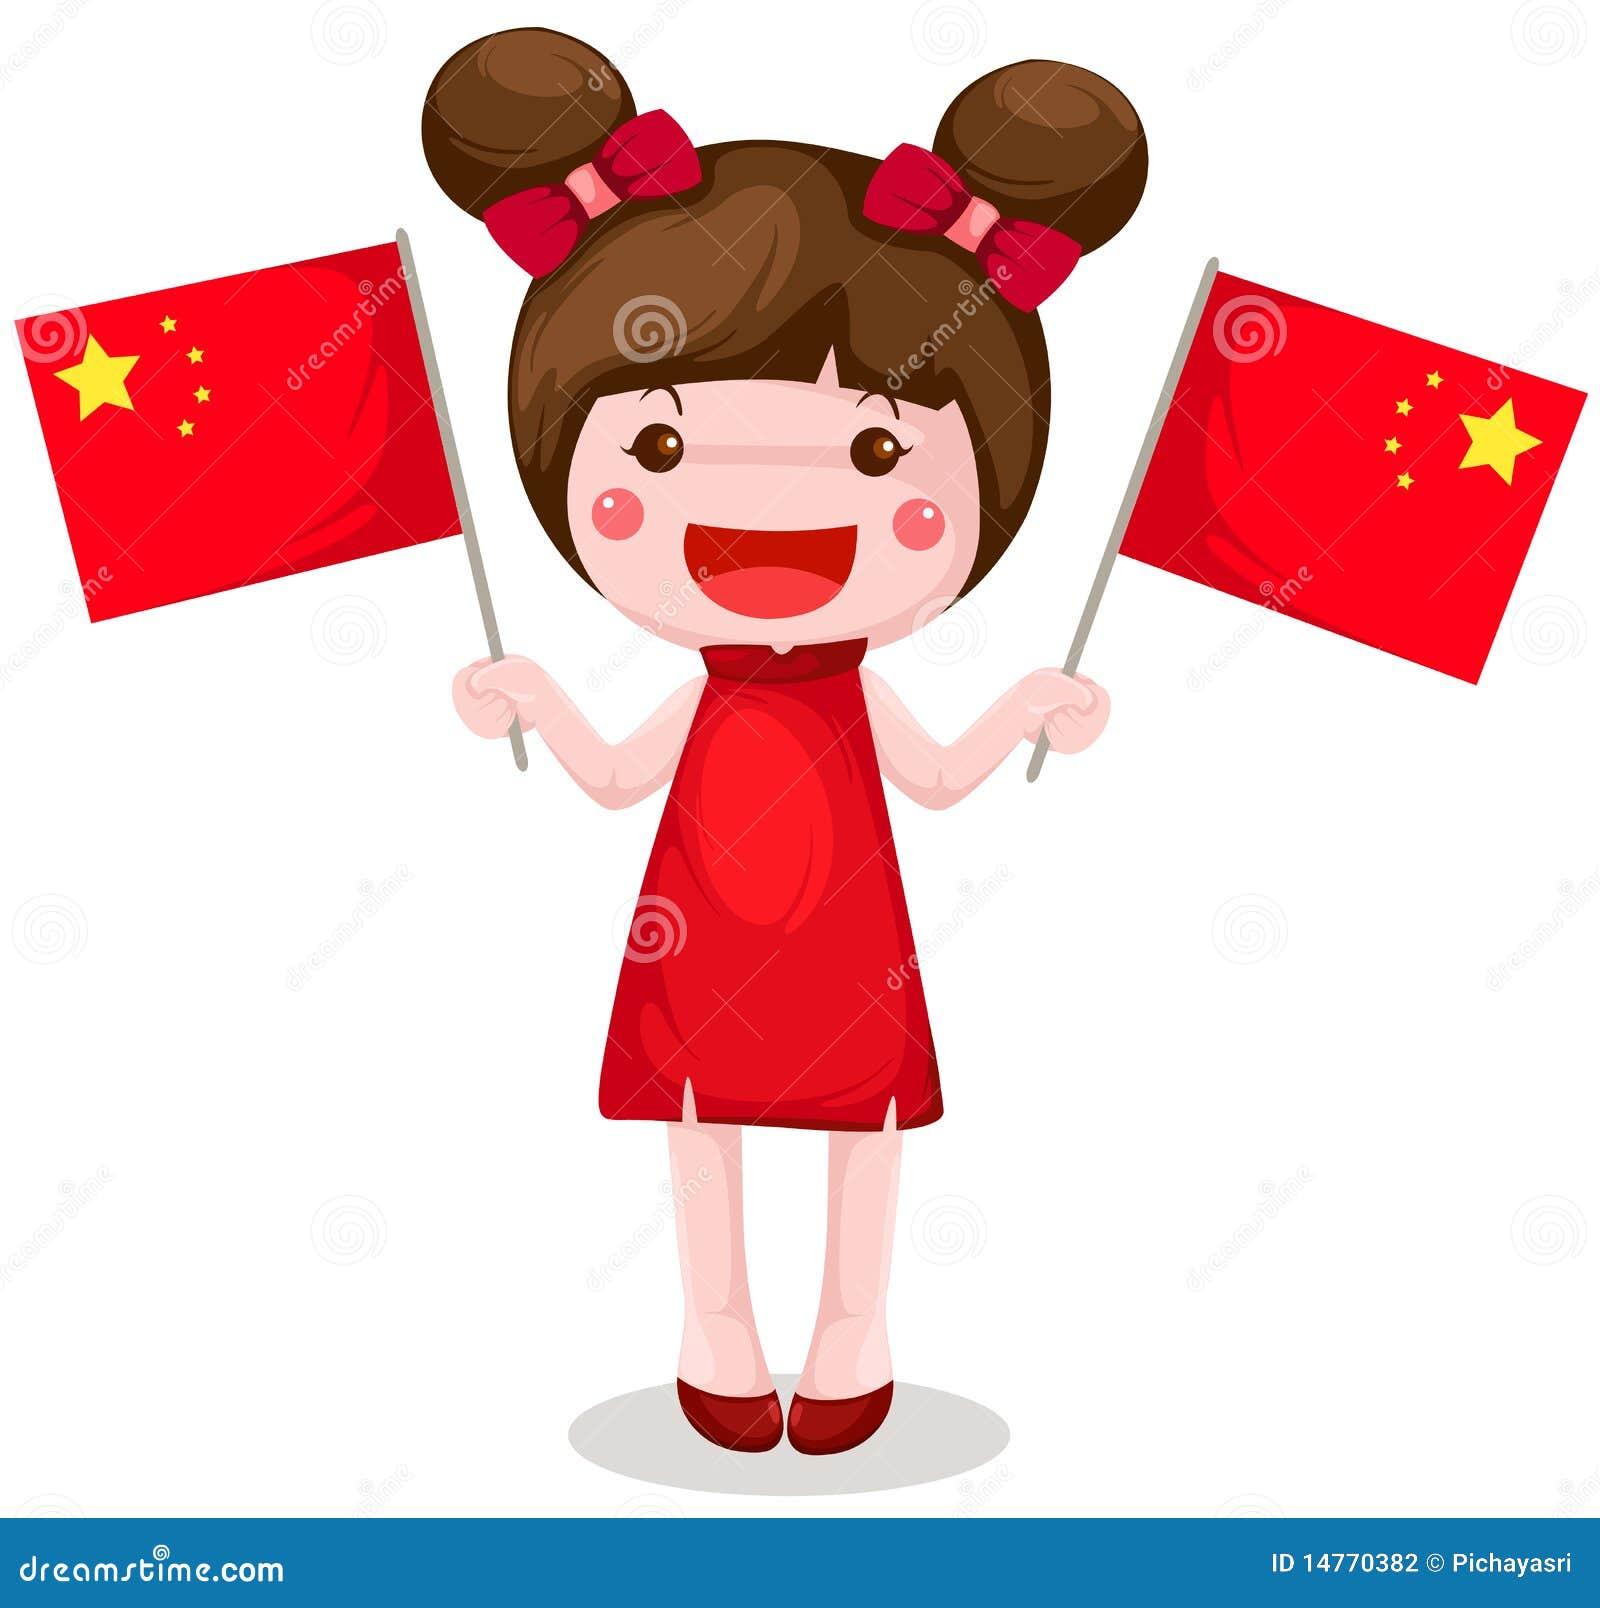 Chinese Flag Stock Illustrations 19 486 Chinese Flag Stock Illustrations Vectors Clipart Dreamstime